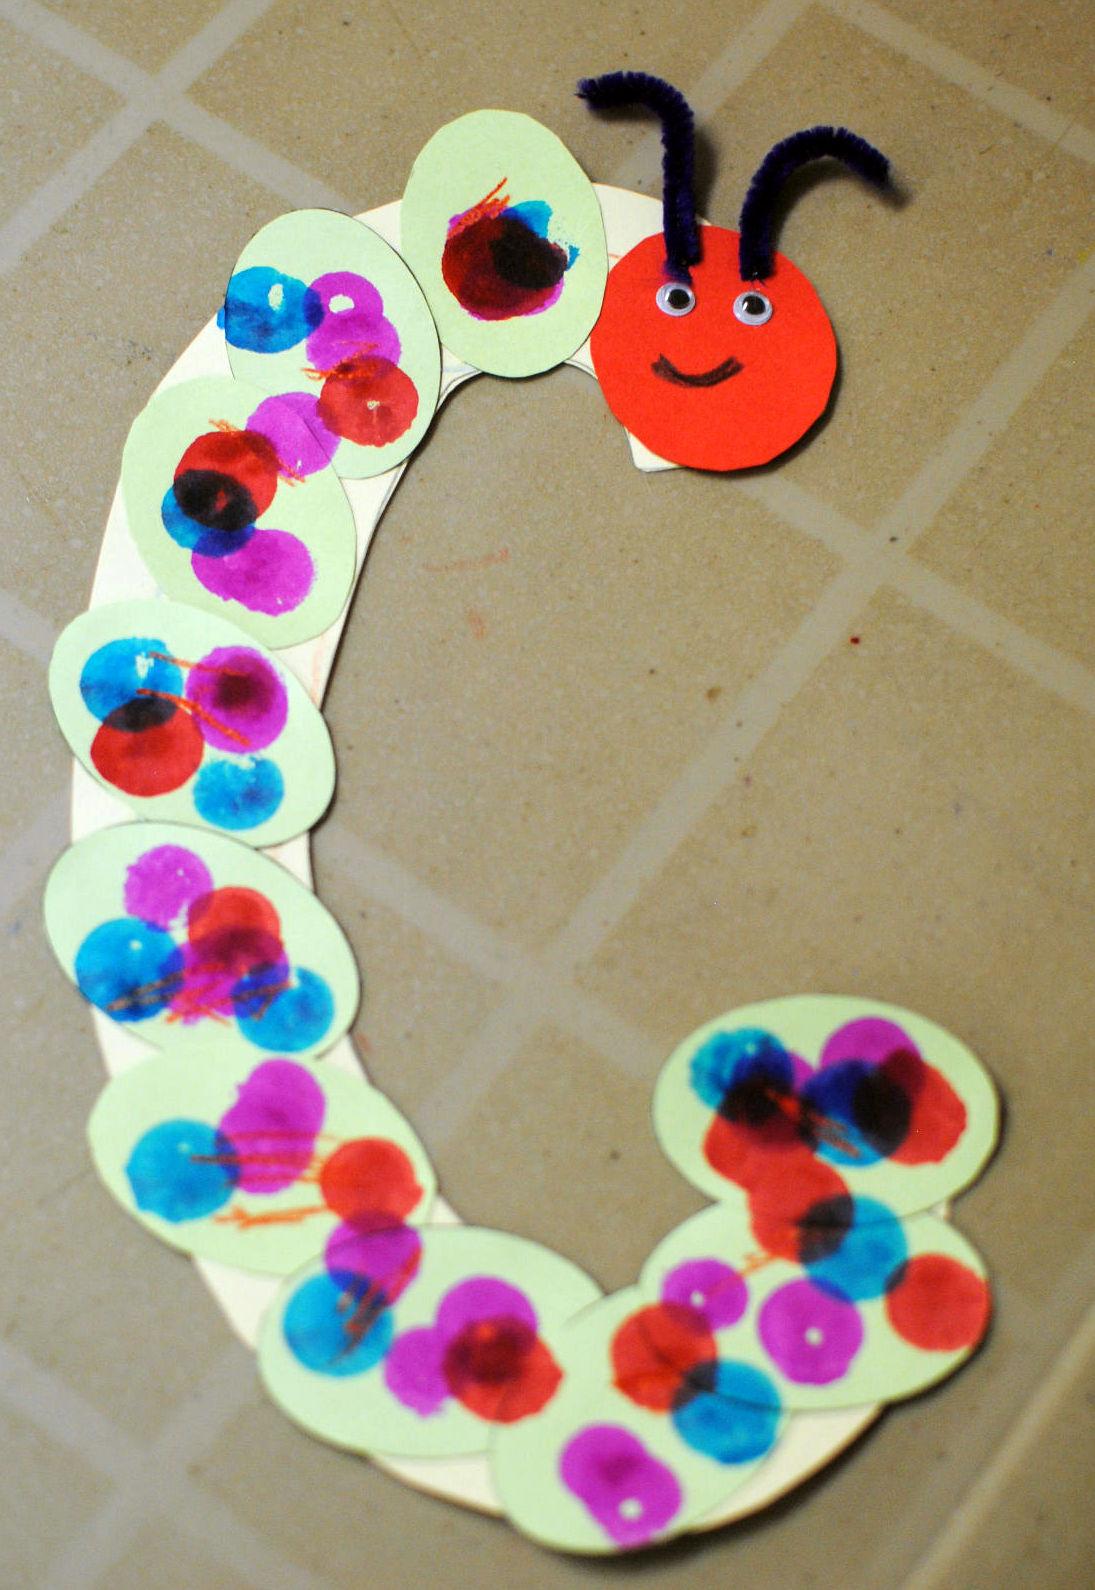 Letter Crafts Letterc Play Kids Crafts Alphabet Crafts Letter C Crafts Fun Through